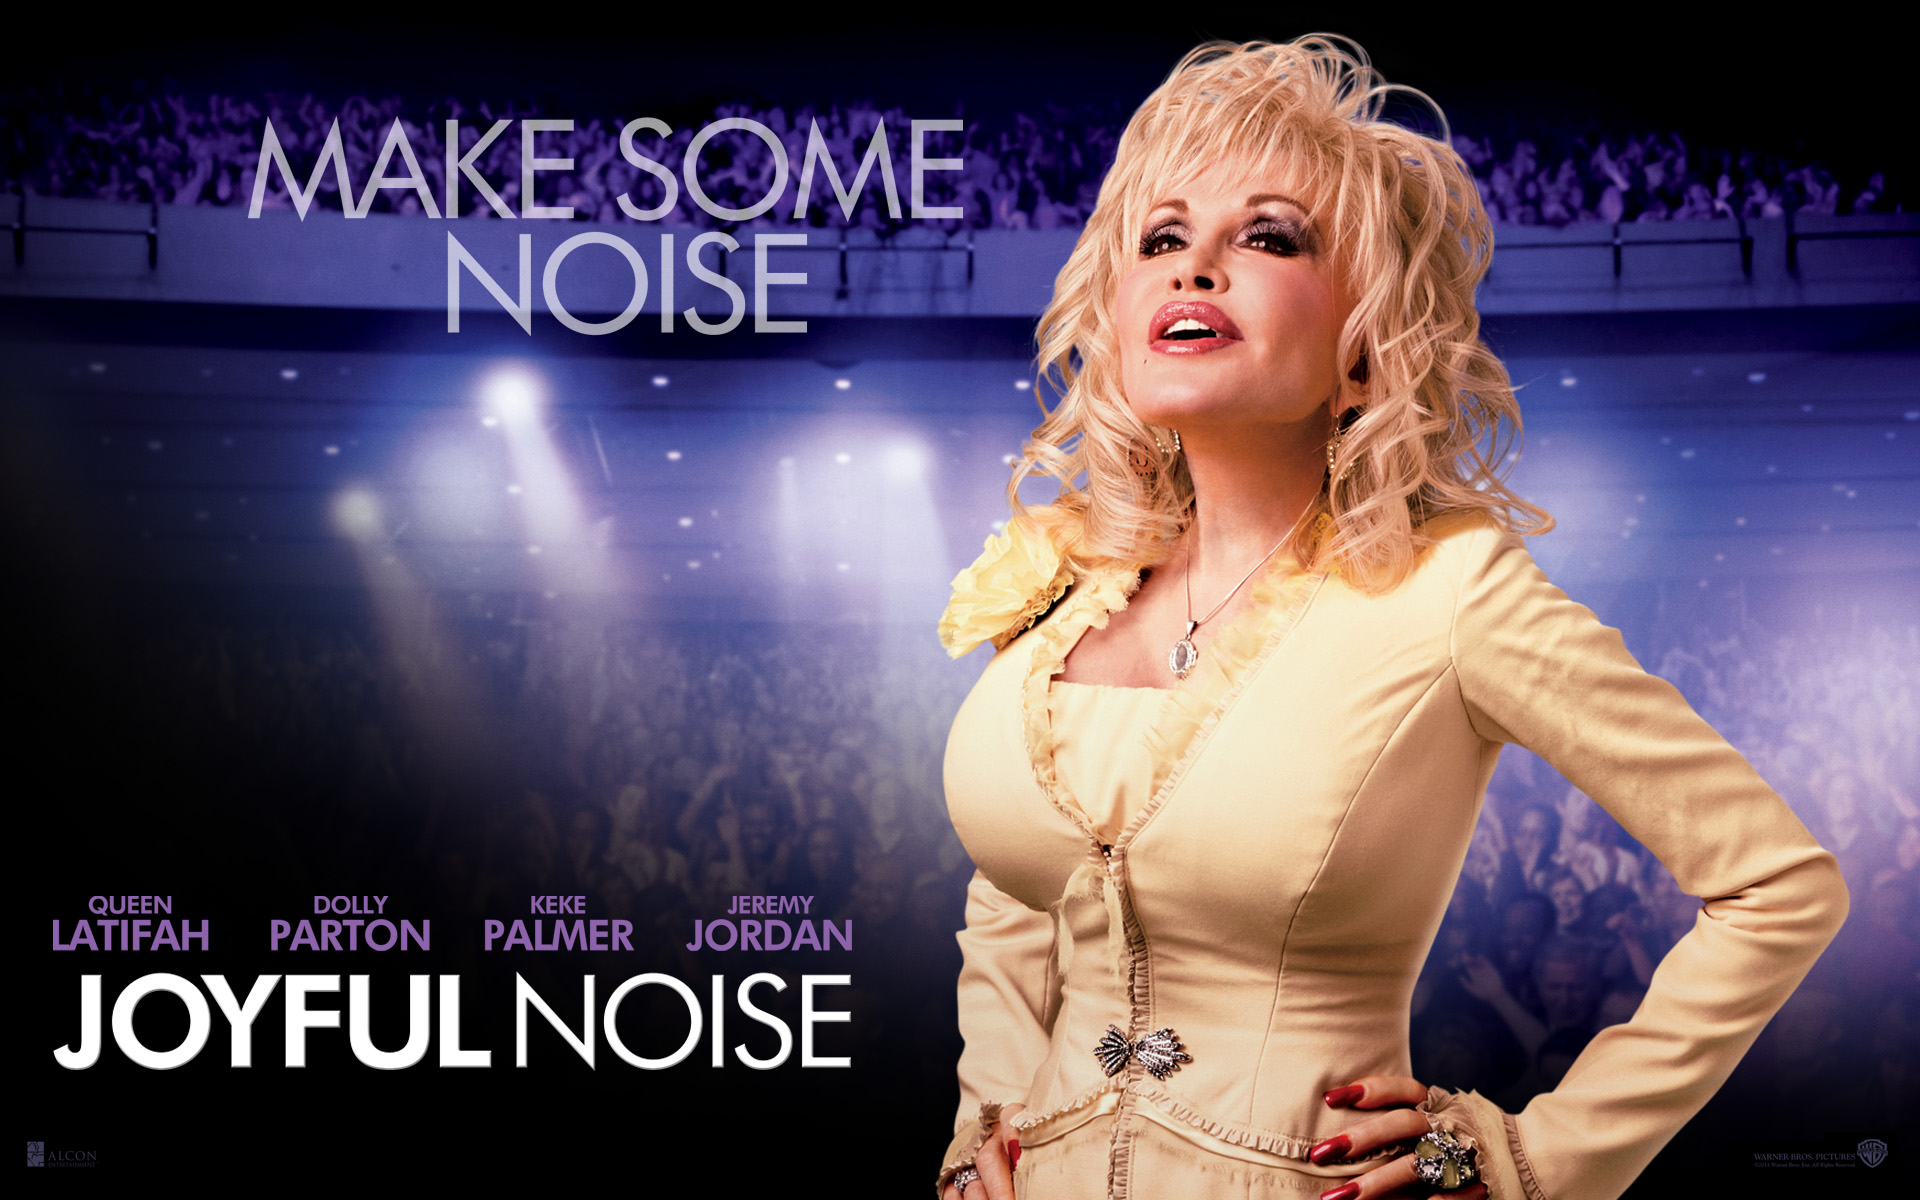 joyful noise, 1920 × 1200 in Celebrities